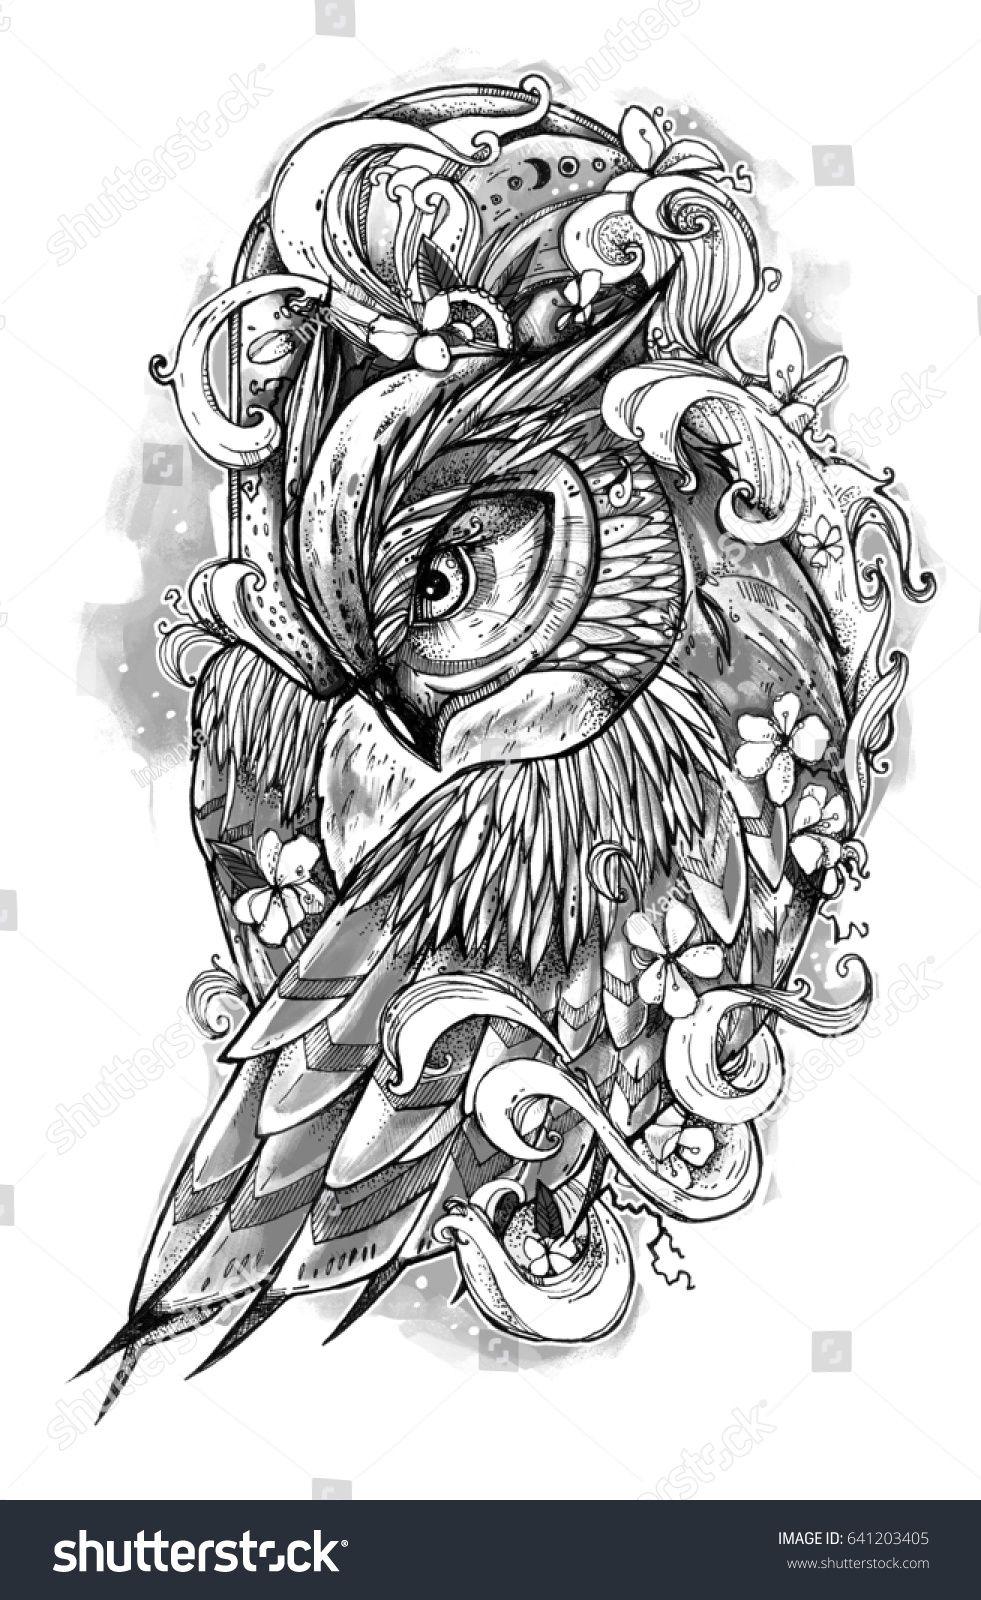 Tattoo Owl Tattoo Owl Tattoo Drawings Tattoos